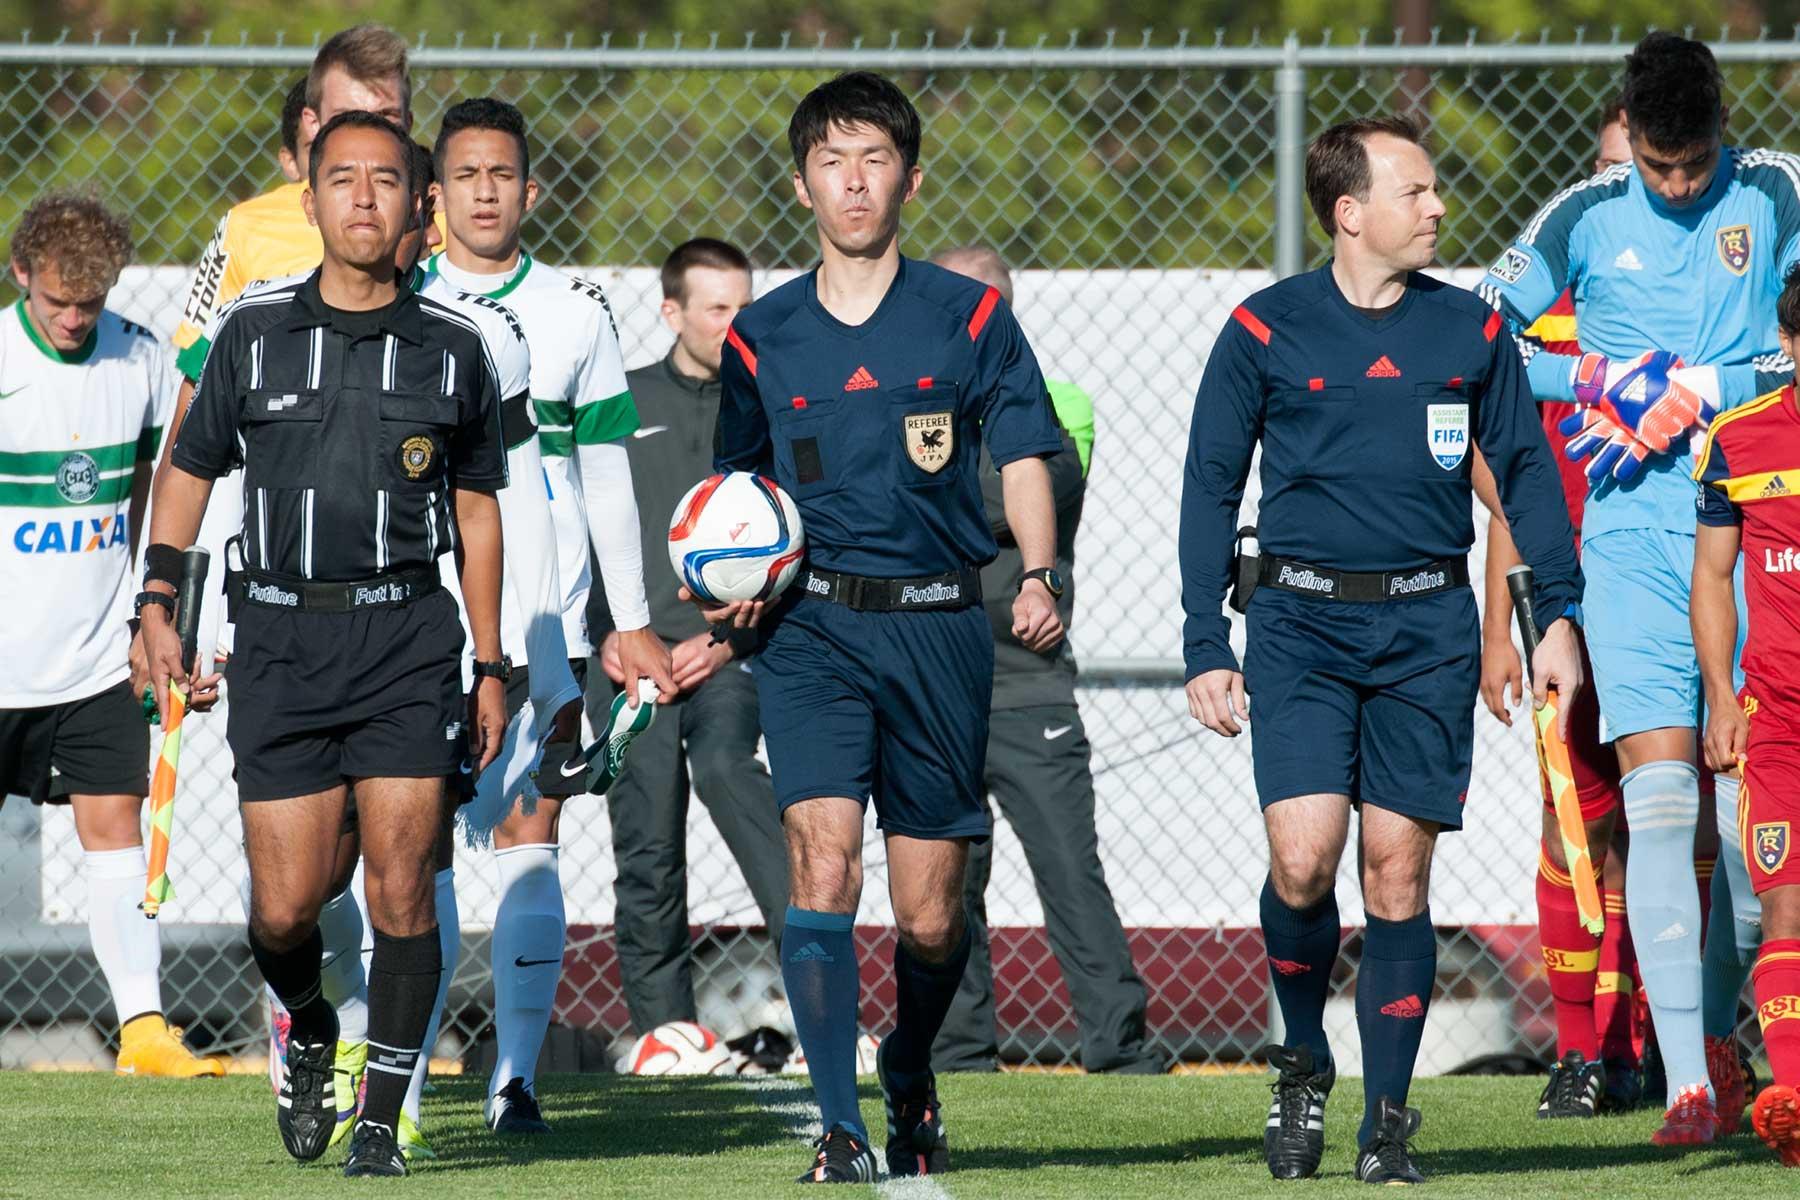 Real Salt Lake vs  Coritiba FC - 2015 Dallas Cup - Photos by